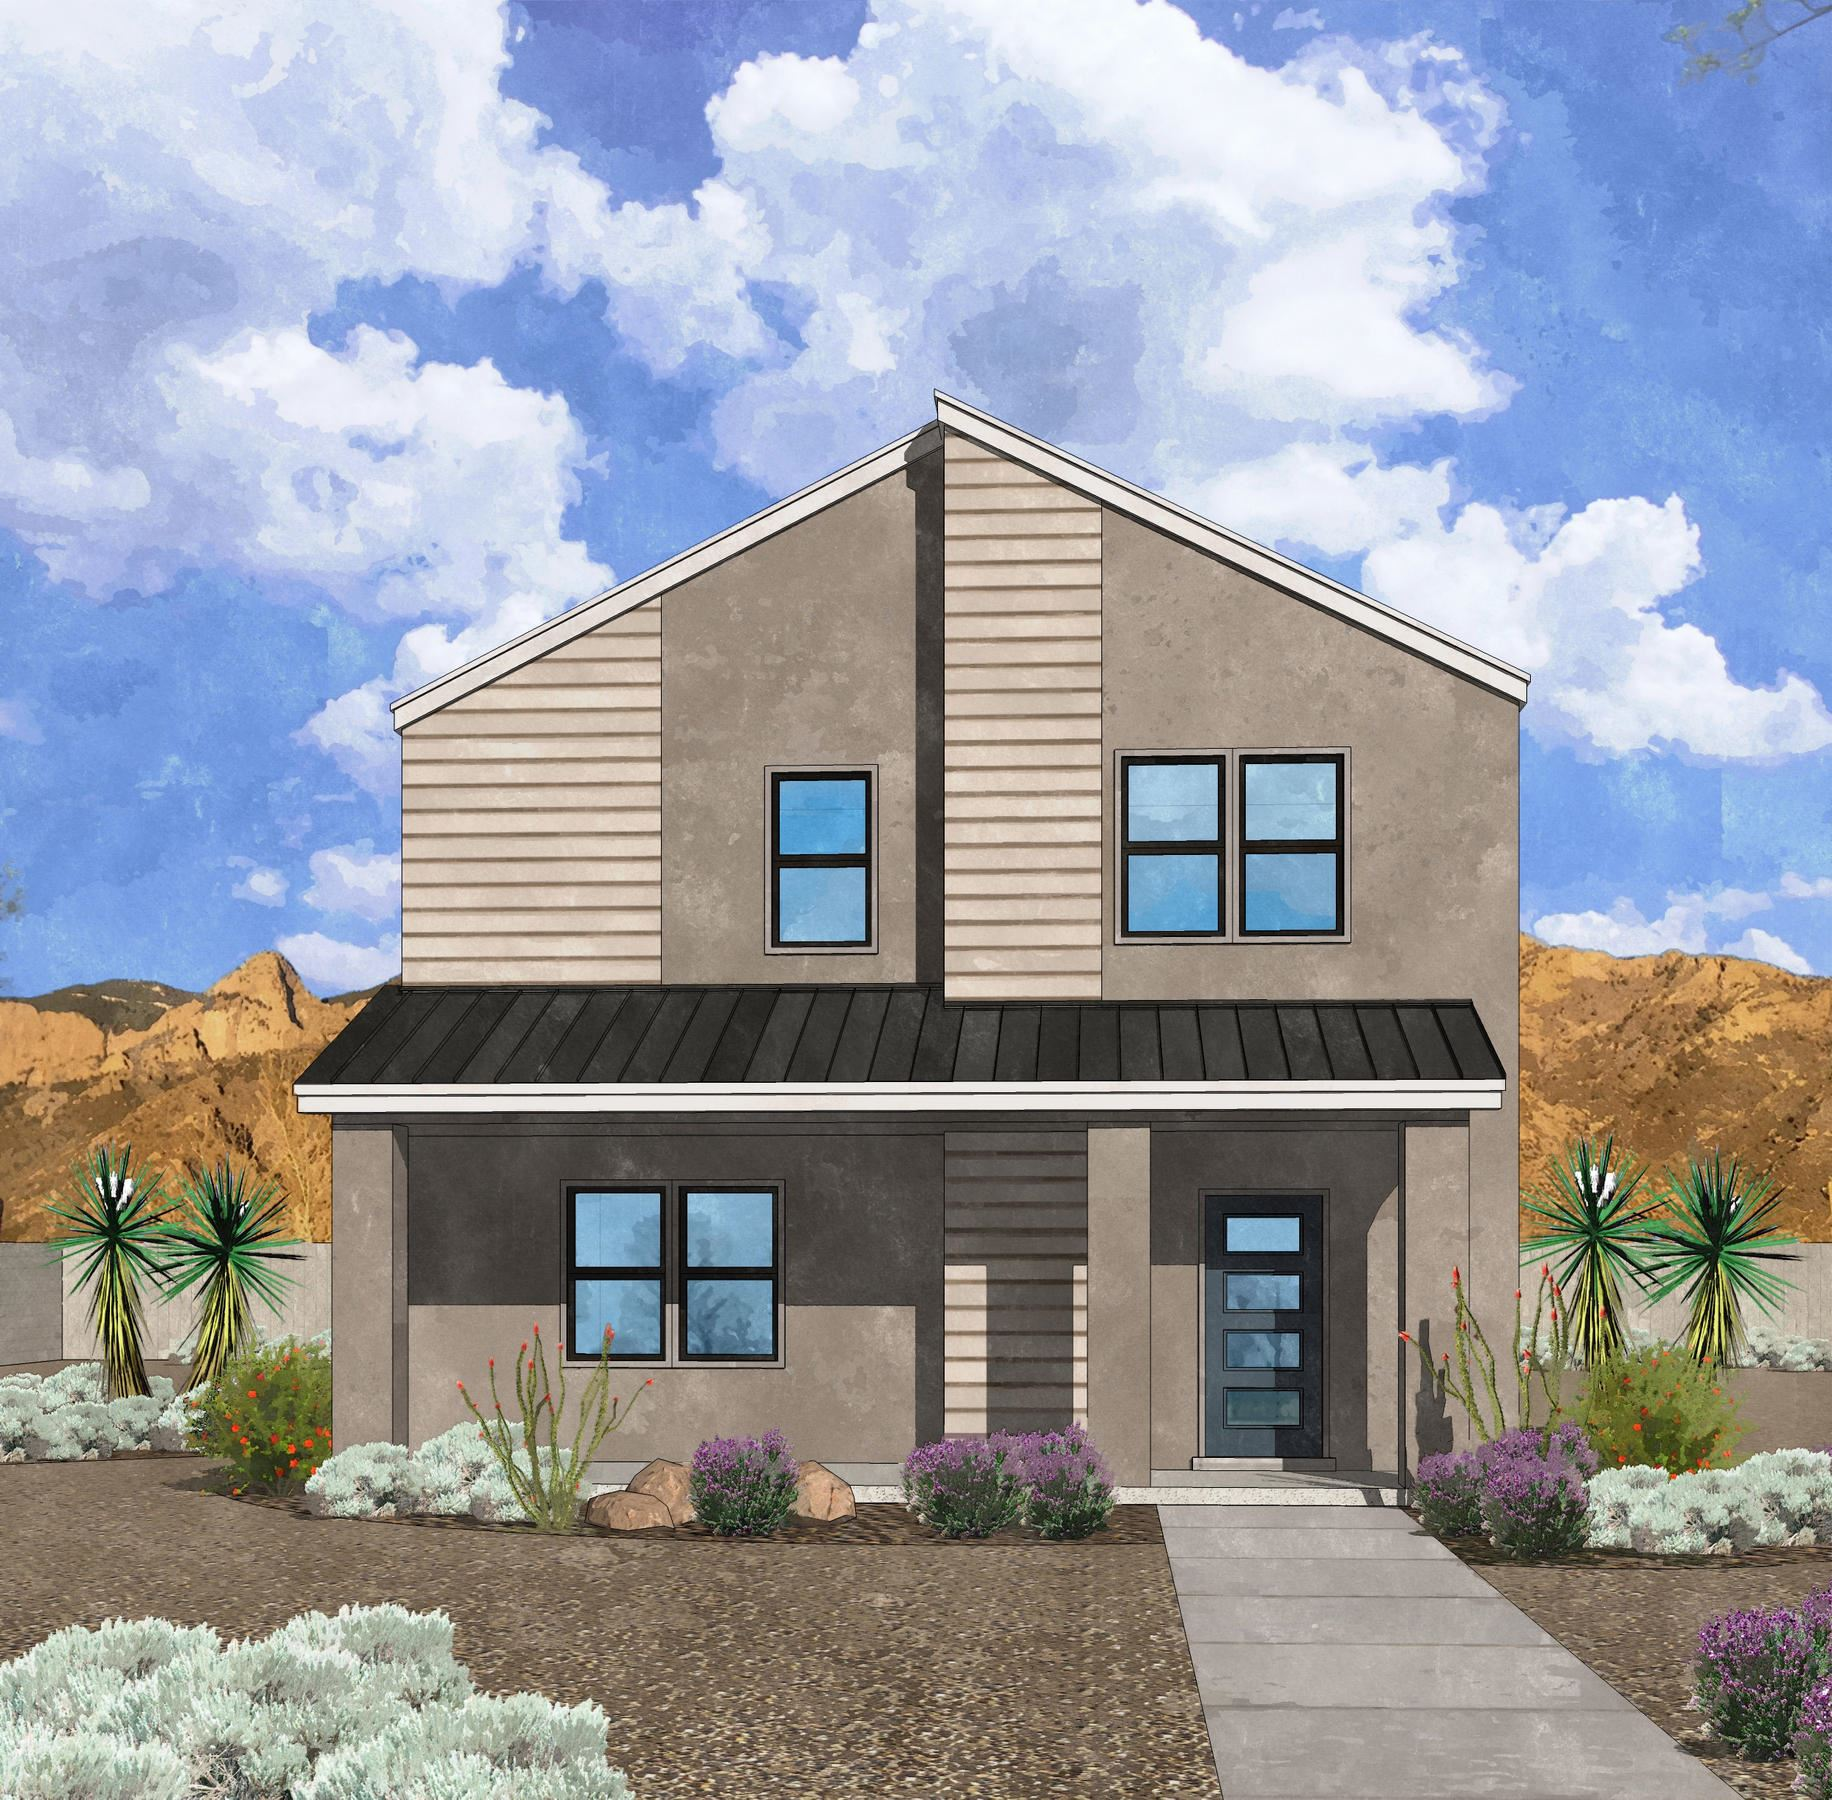 6115 Motherwell Drive SE, Albuquerque, NM 87105 - MLS#: 985544